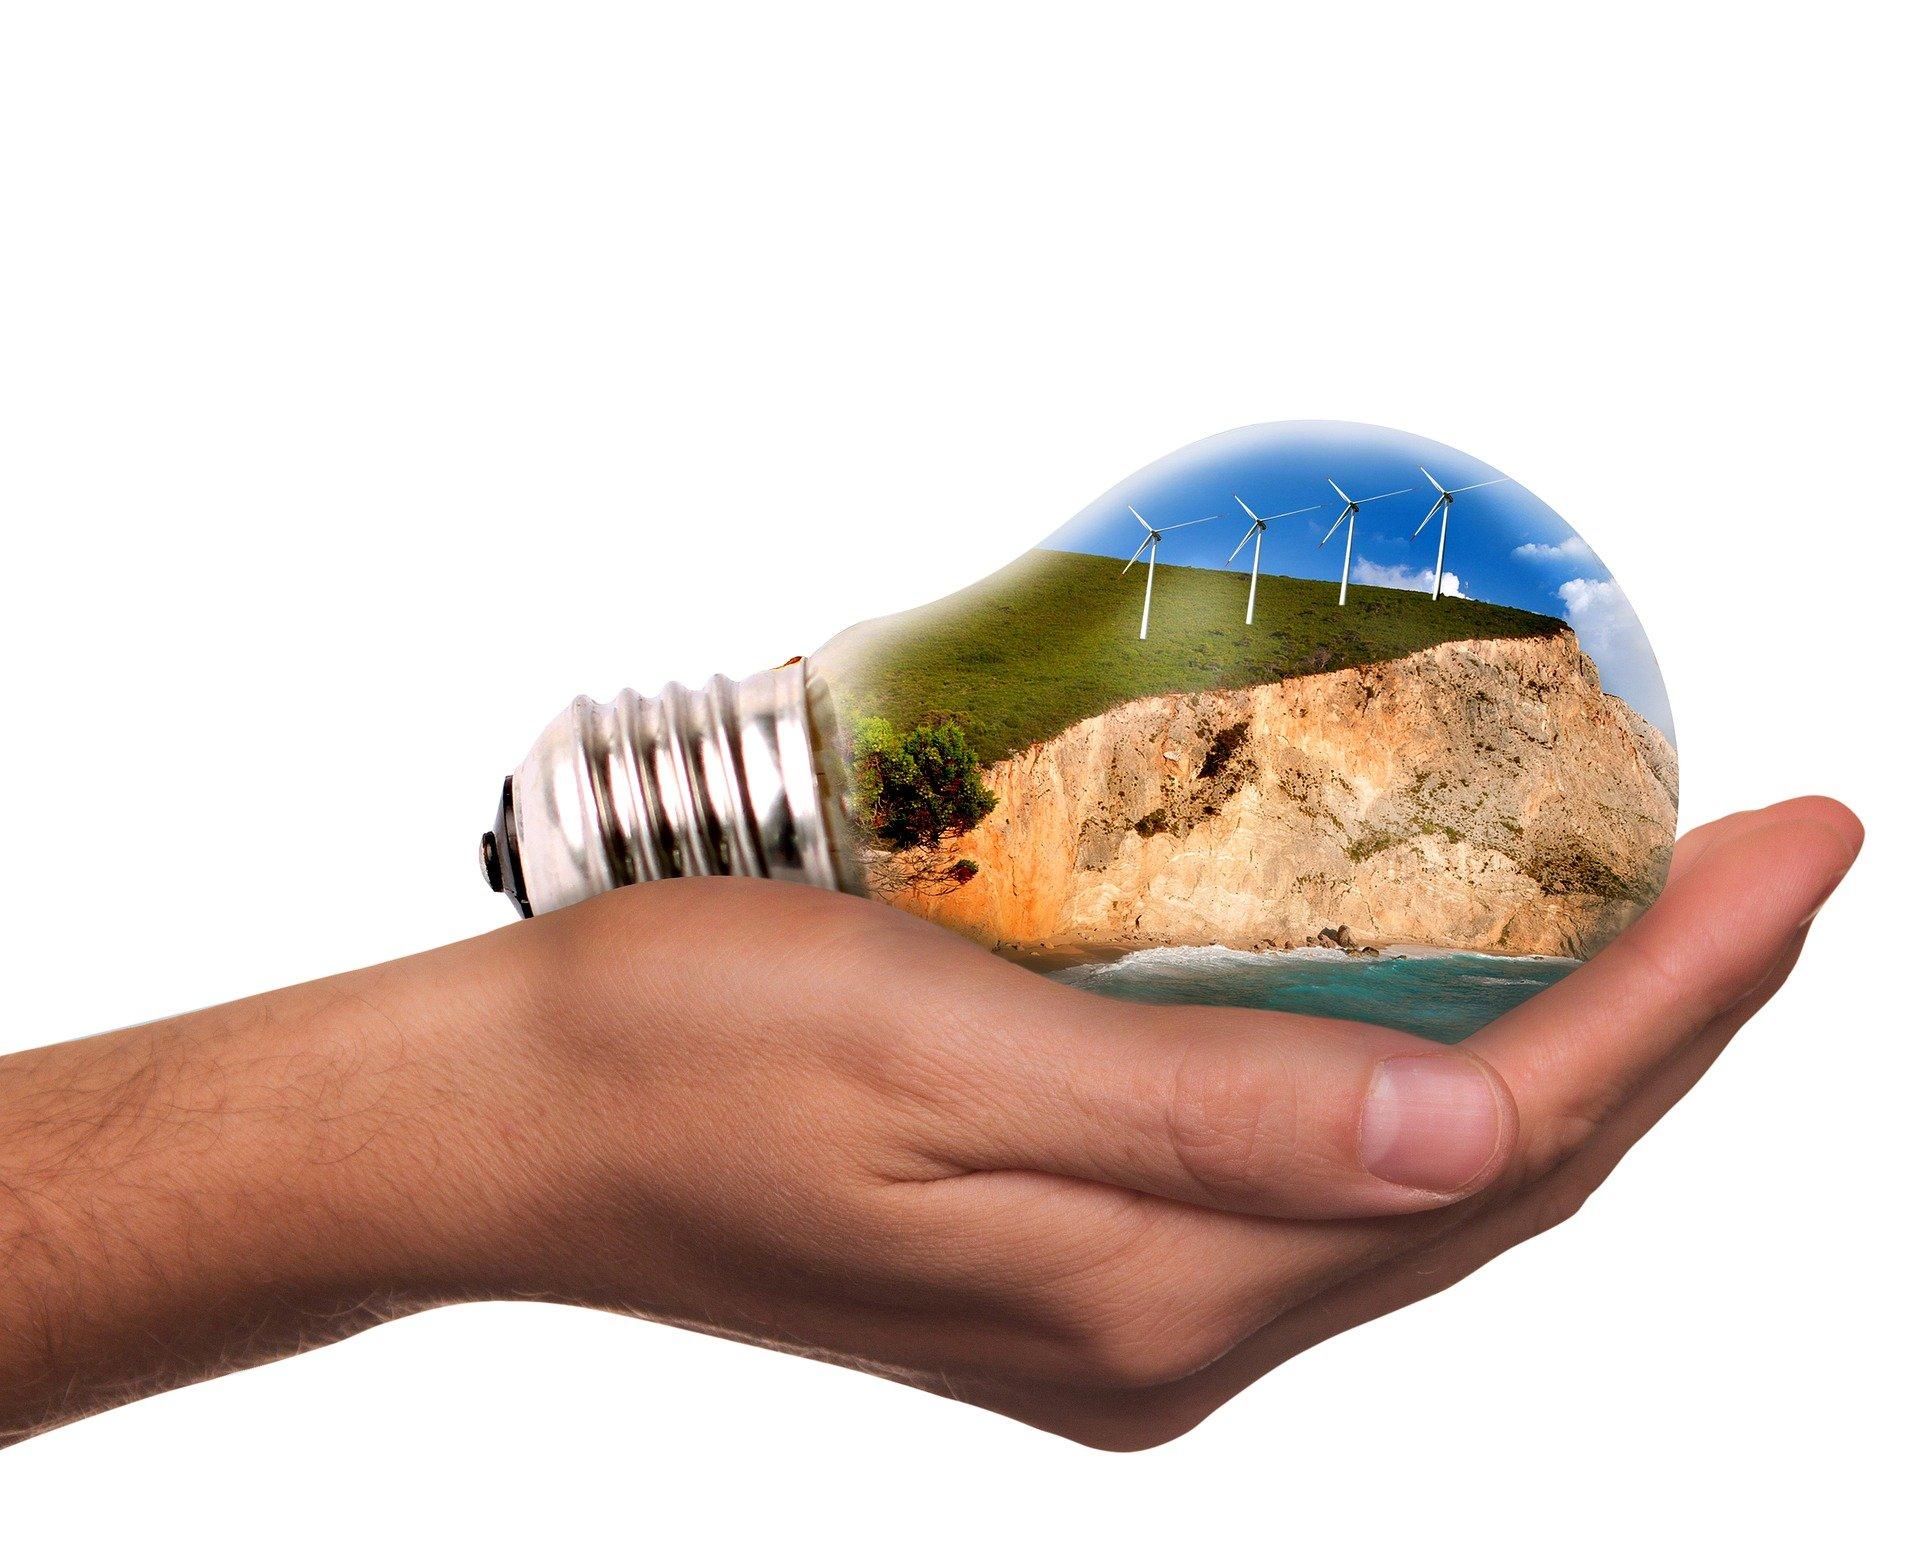 https://www.ccifrance-allemagne.fr/wp-content/uploads/2021/02/ampoule_verte_environnement.jpg